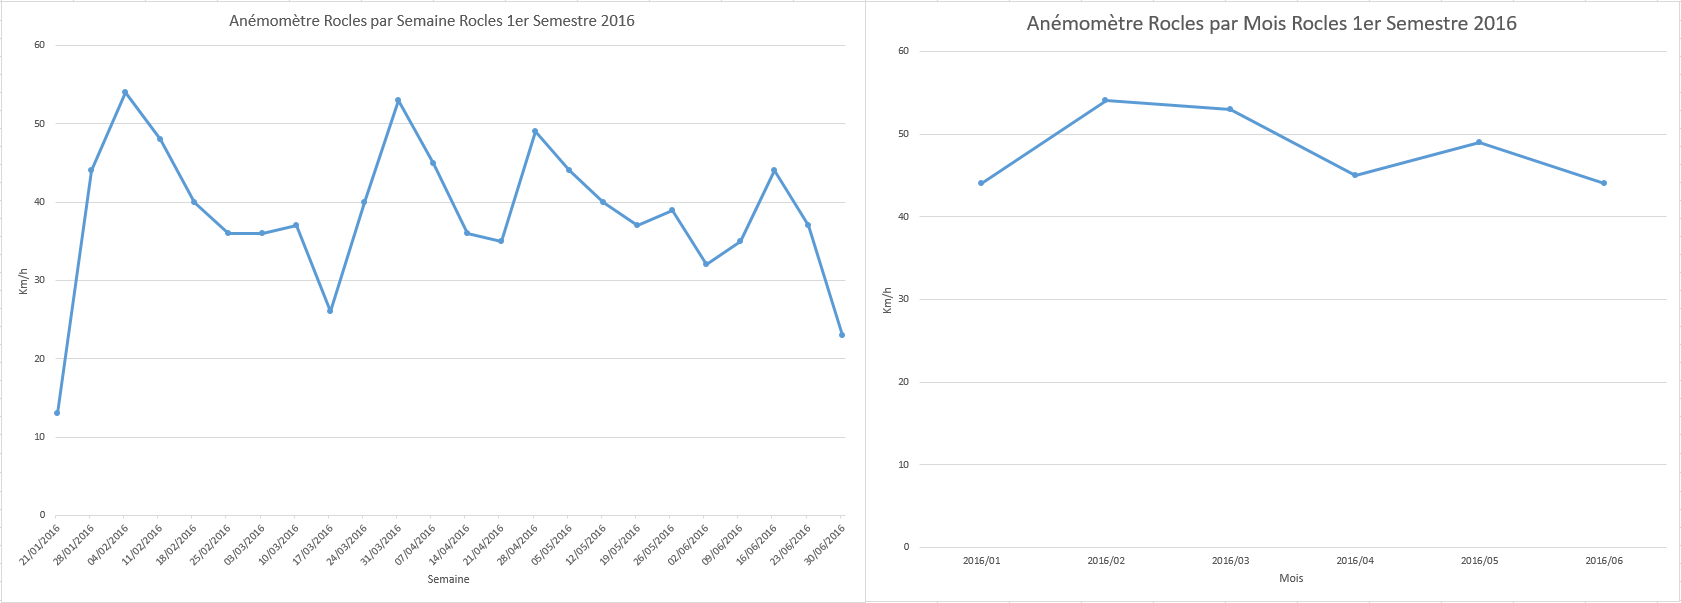 Anémomètre Rocles 1er Semestre 2016